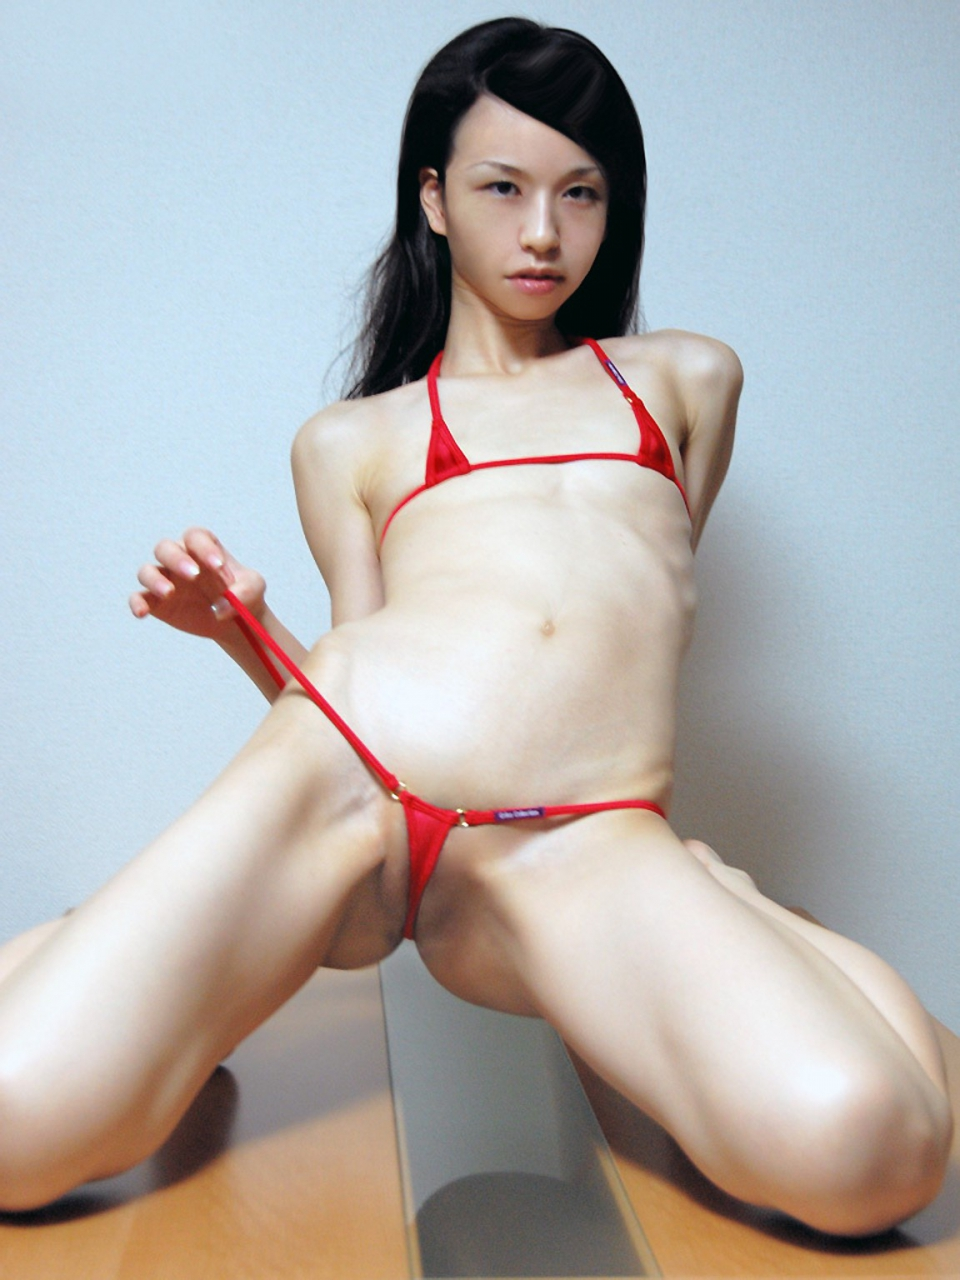 Phoenix marie anal pics